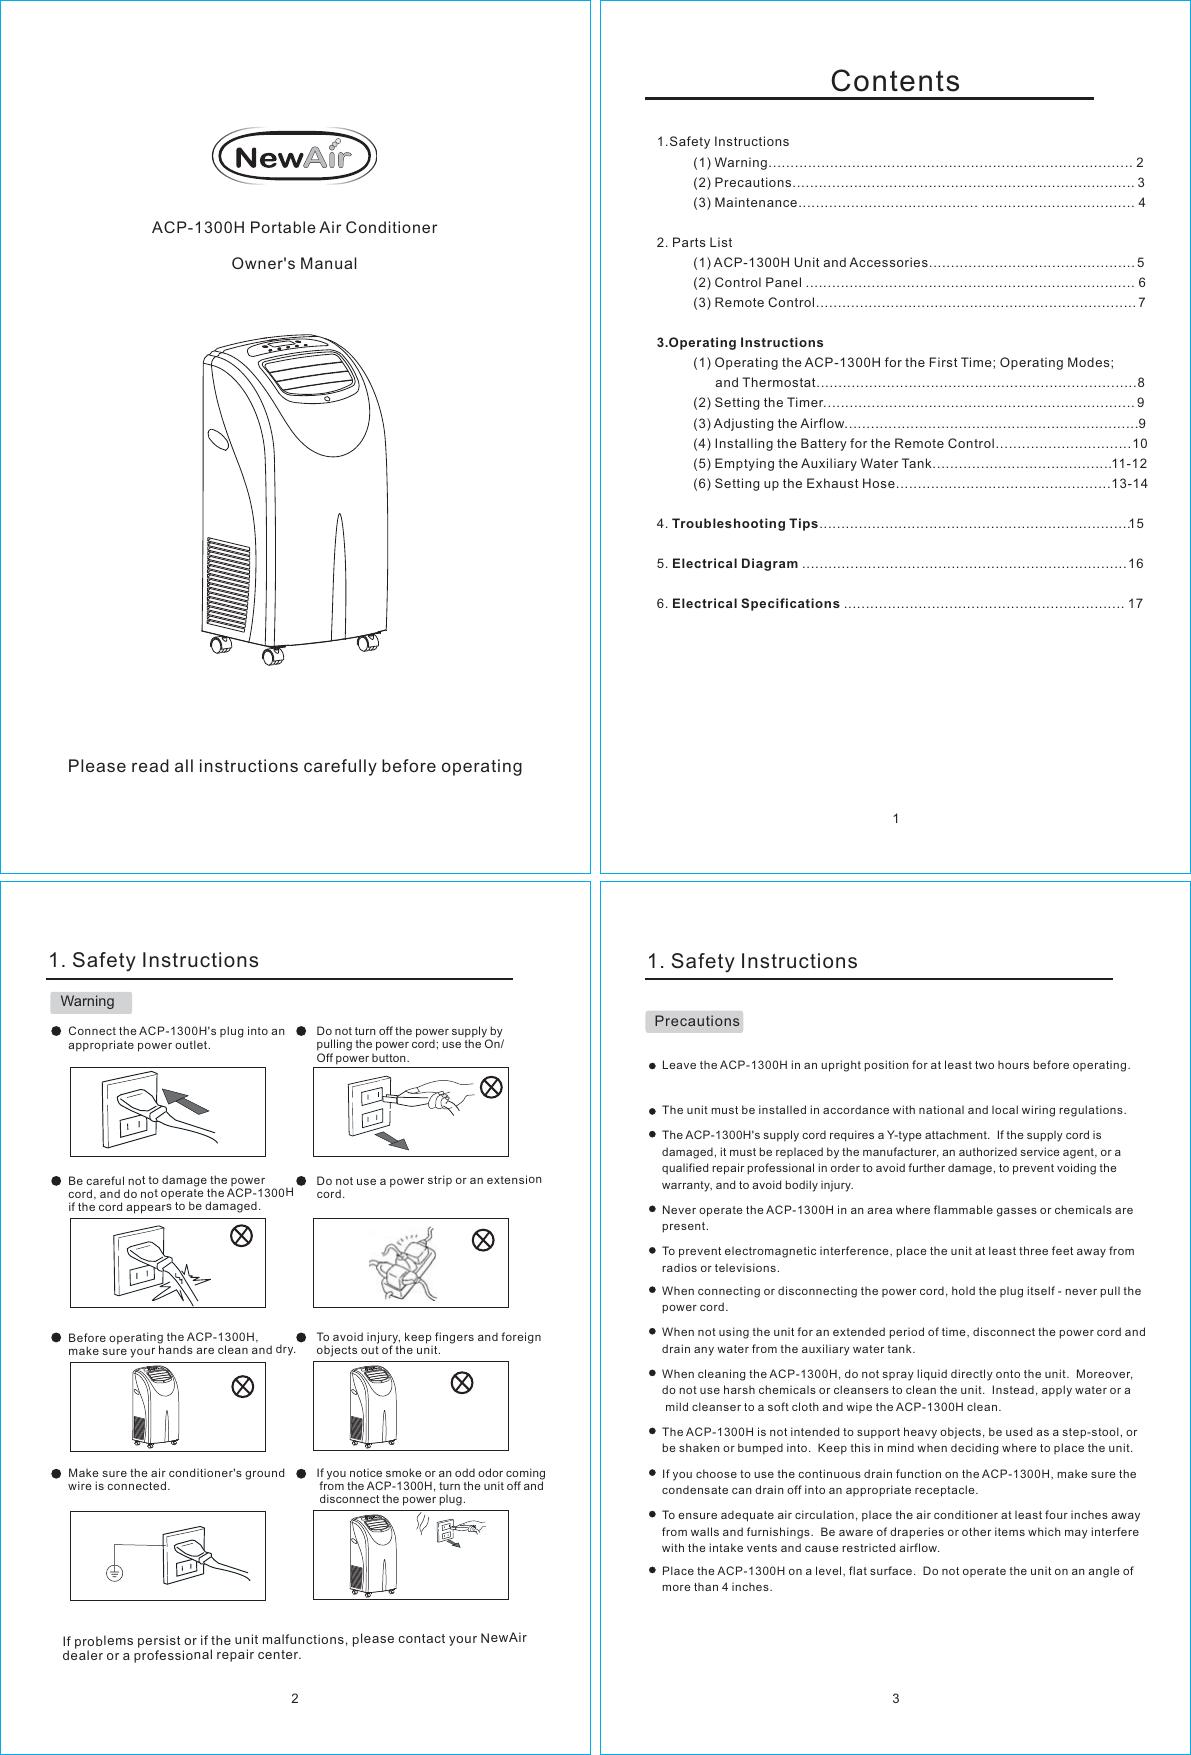 Newair Acp 1300H Users Manual Ooad04\华源 (G)\2008\FJ\3.1...UserManual.wiki